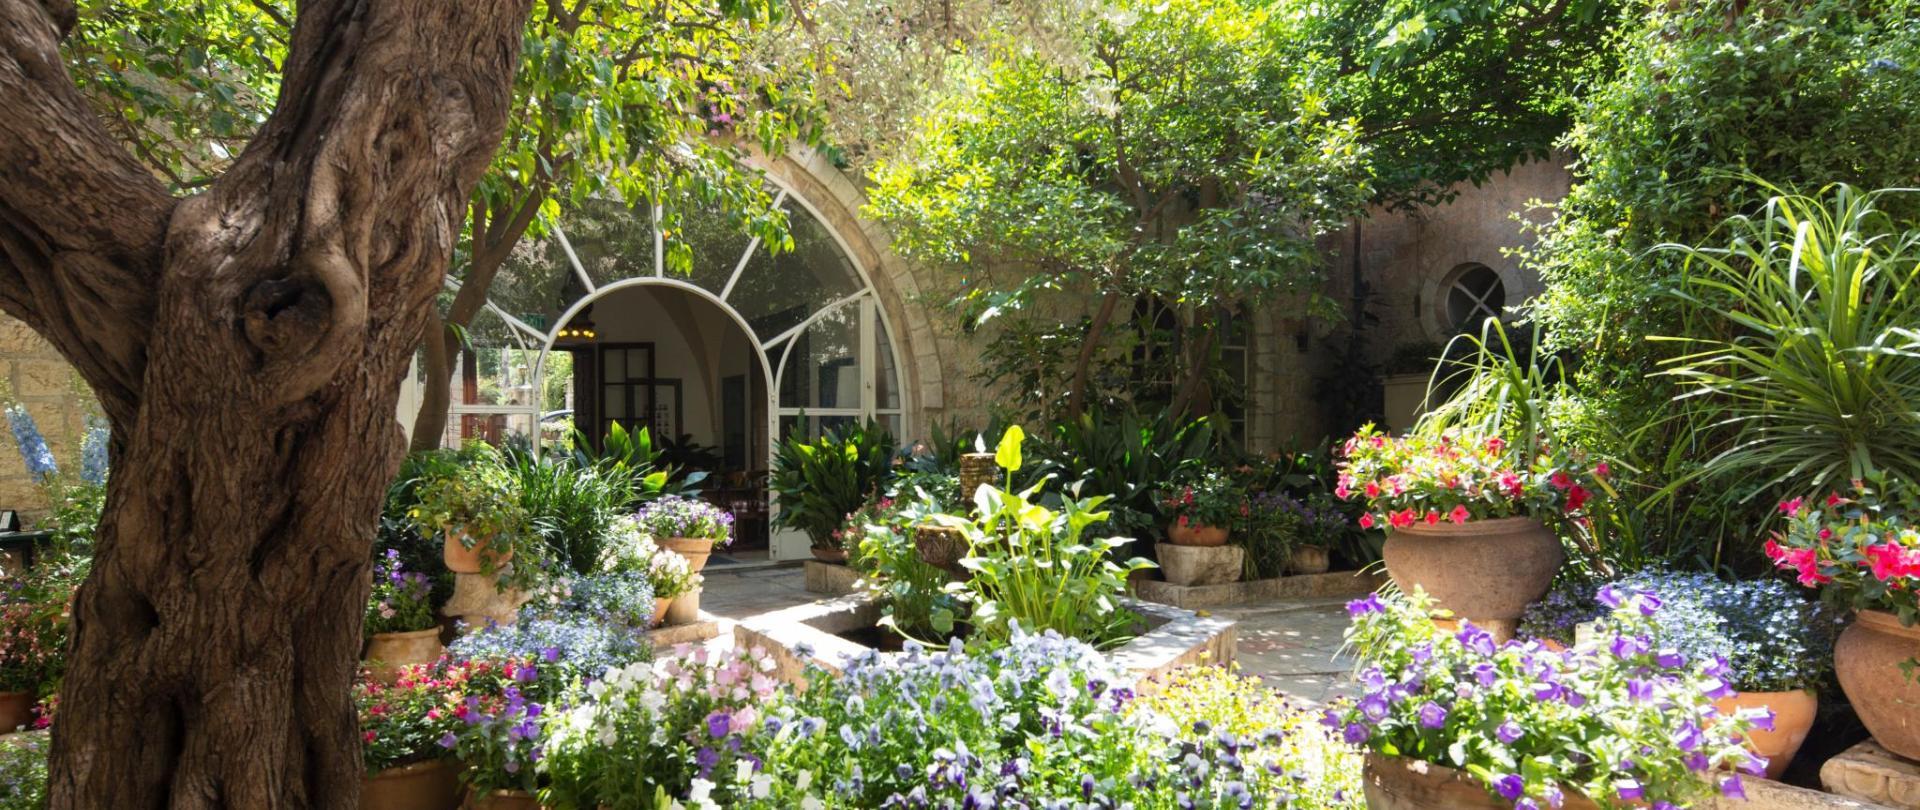 Courtyard_Spring2018_1.jpg